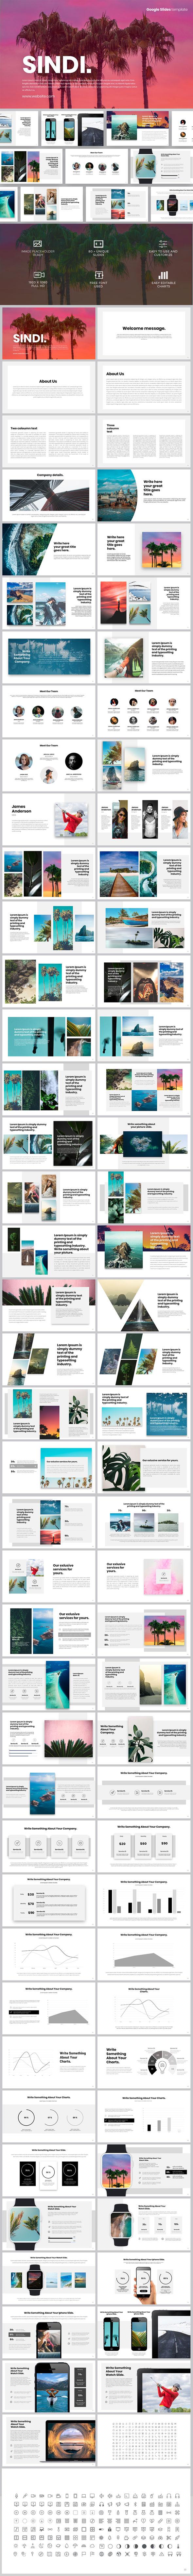 Sindi Google Slides - Google Slides Presentation Templates